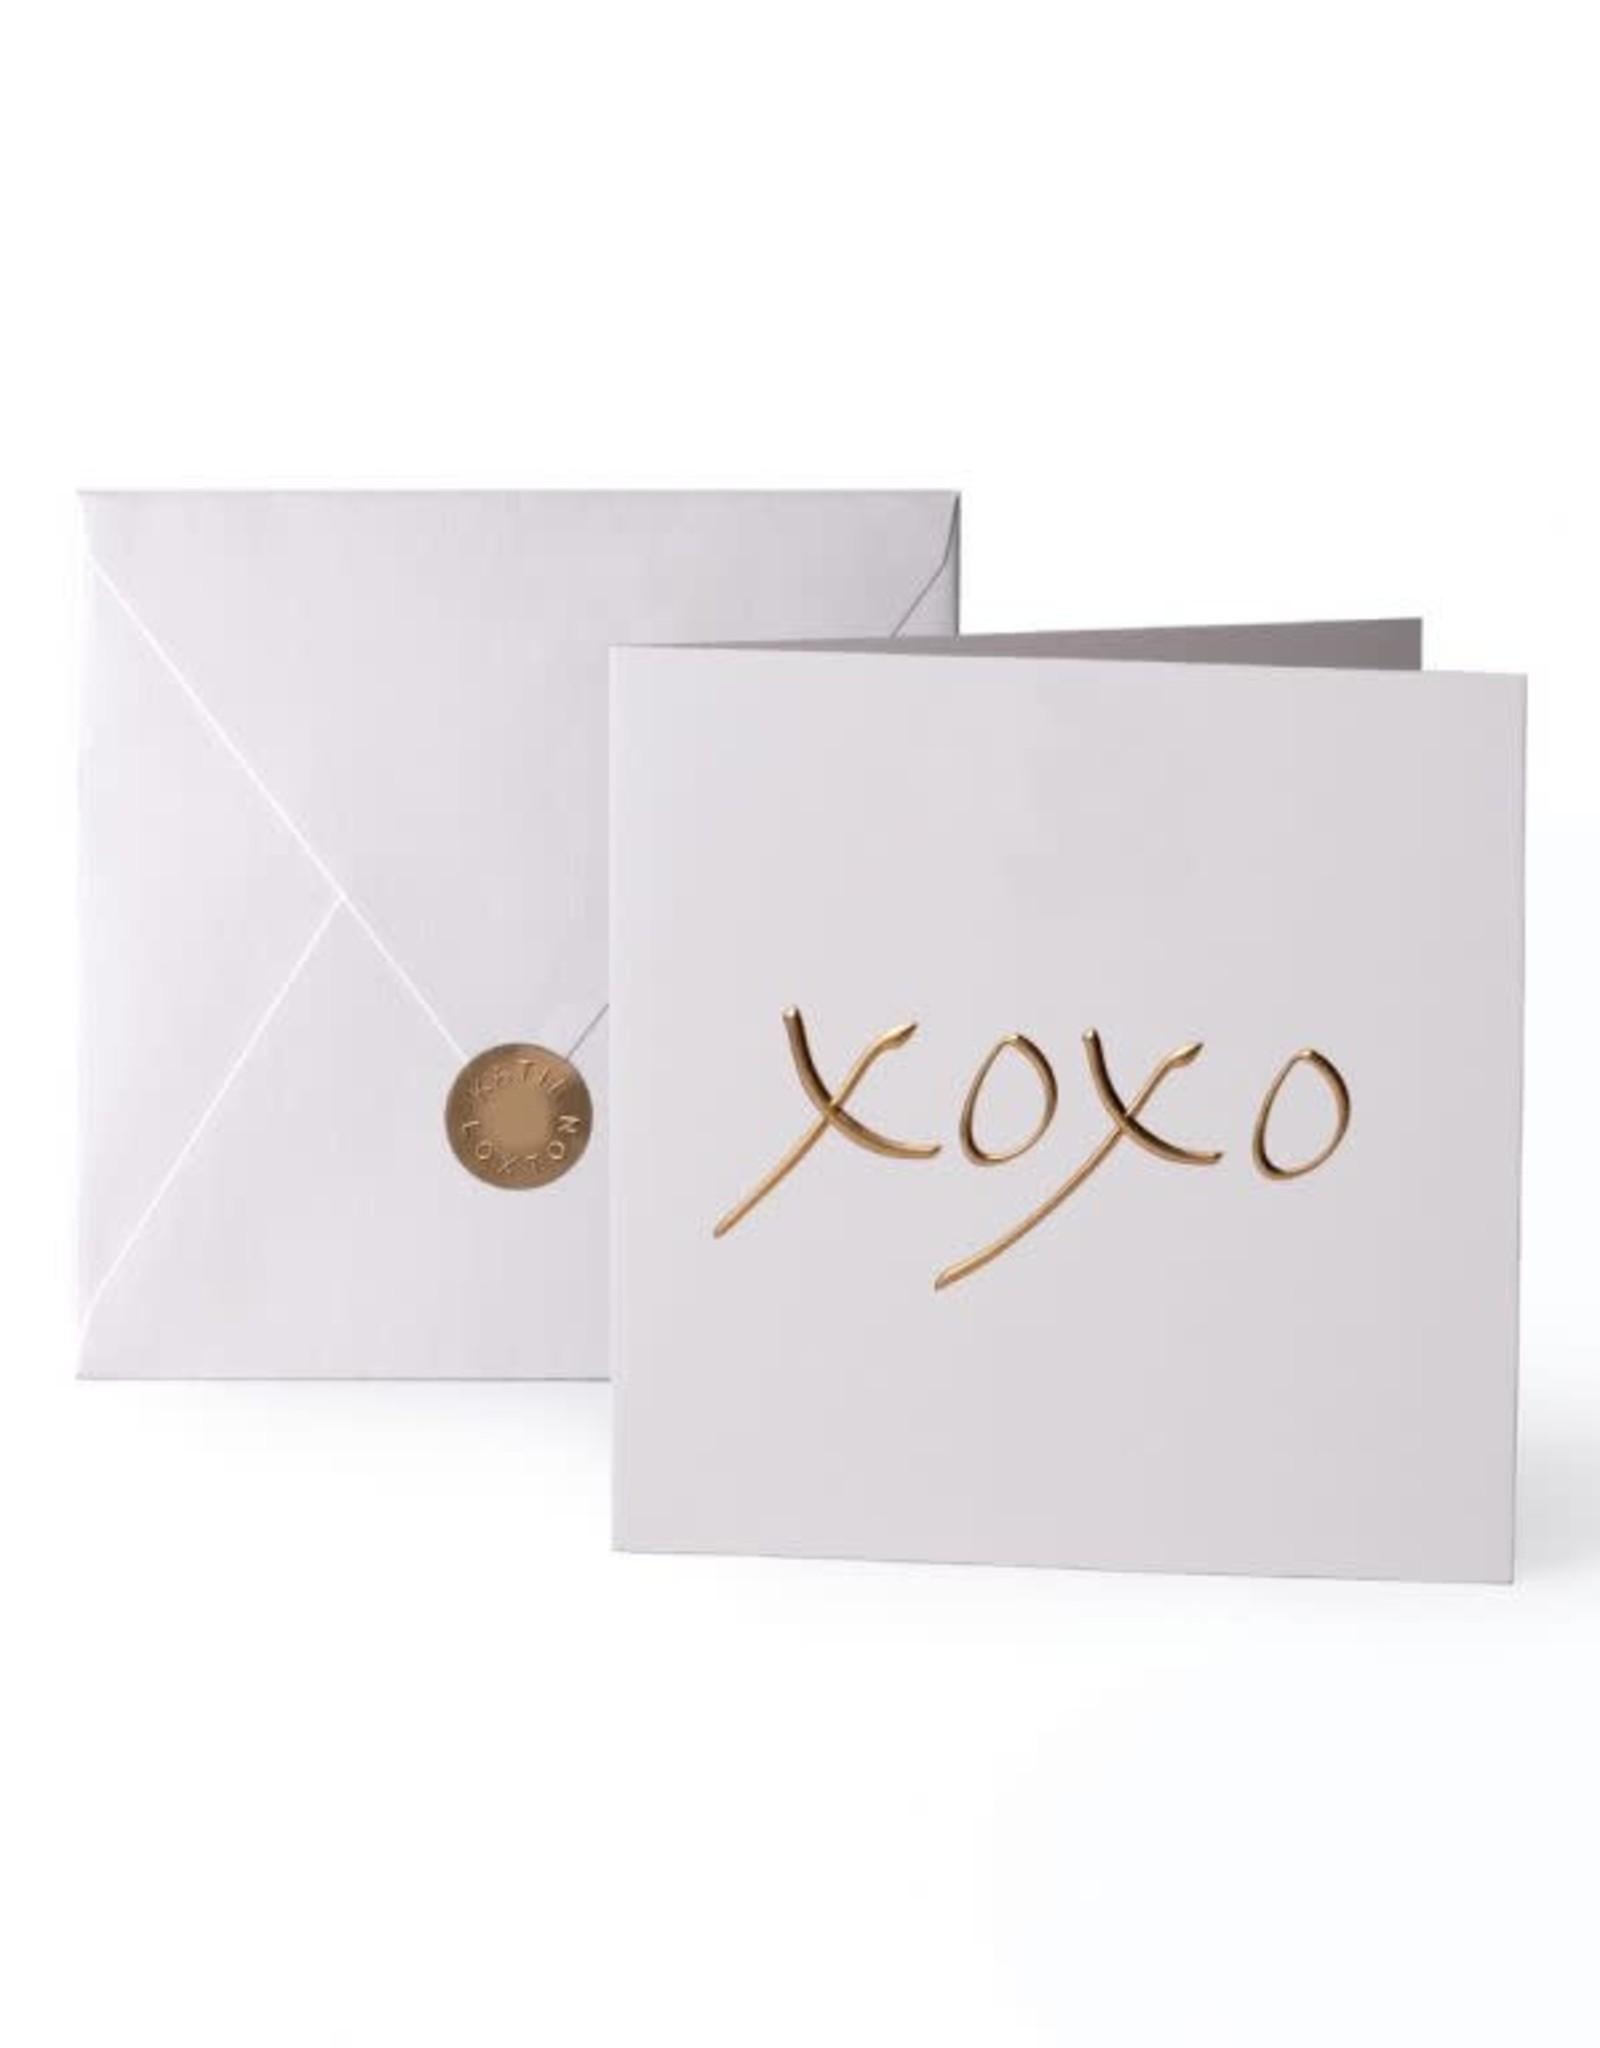 Katie Loxton Greeting Card-xoxo